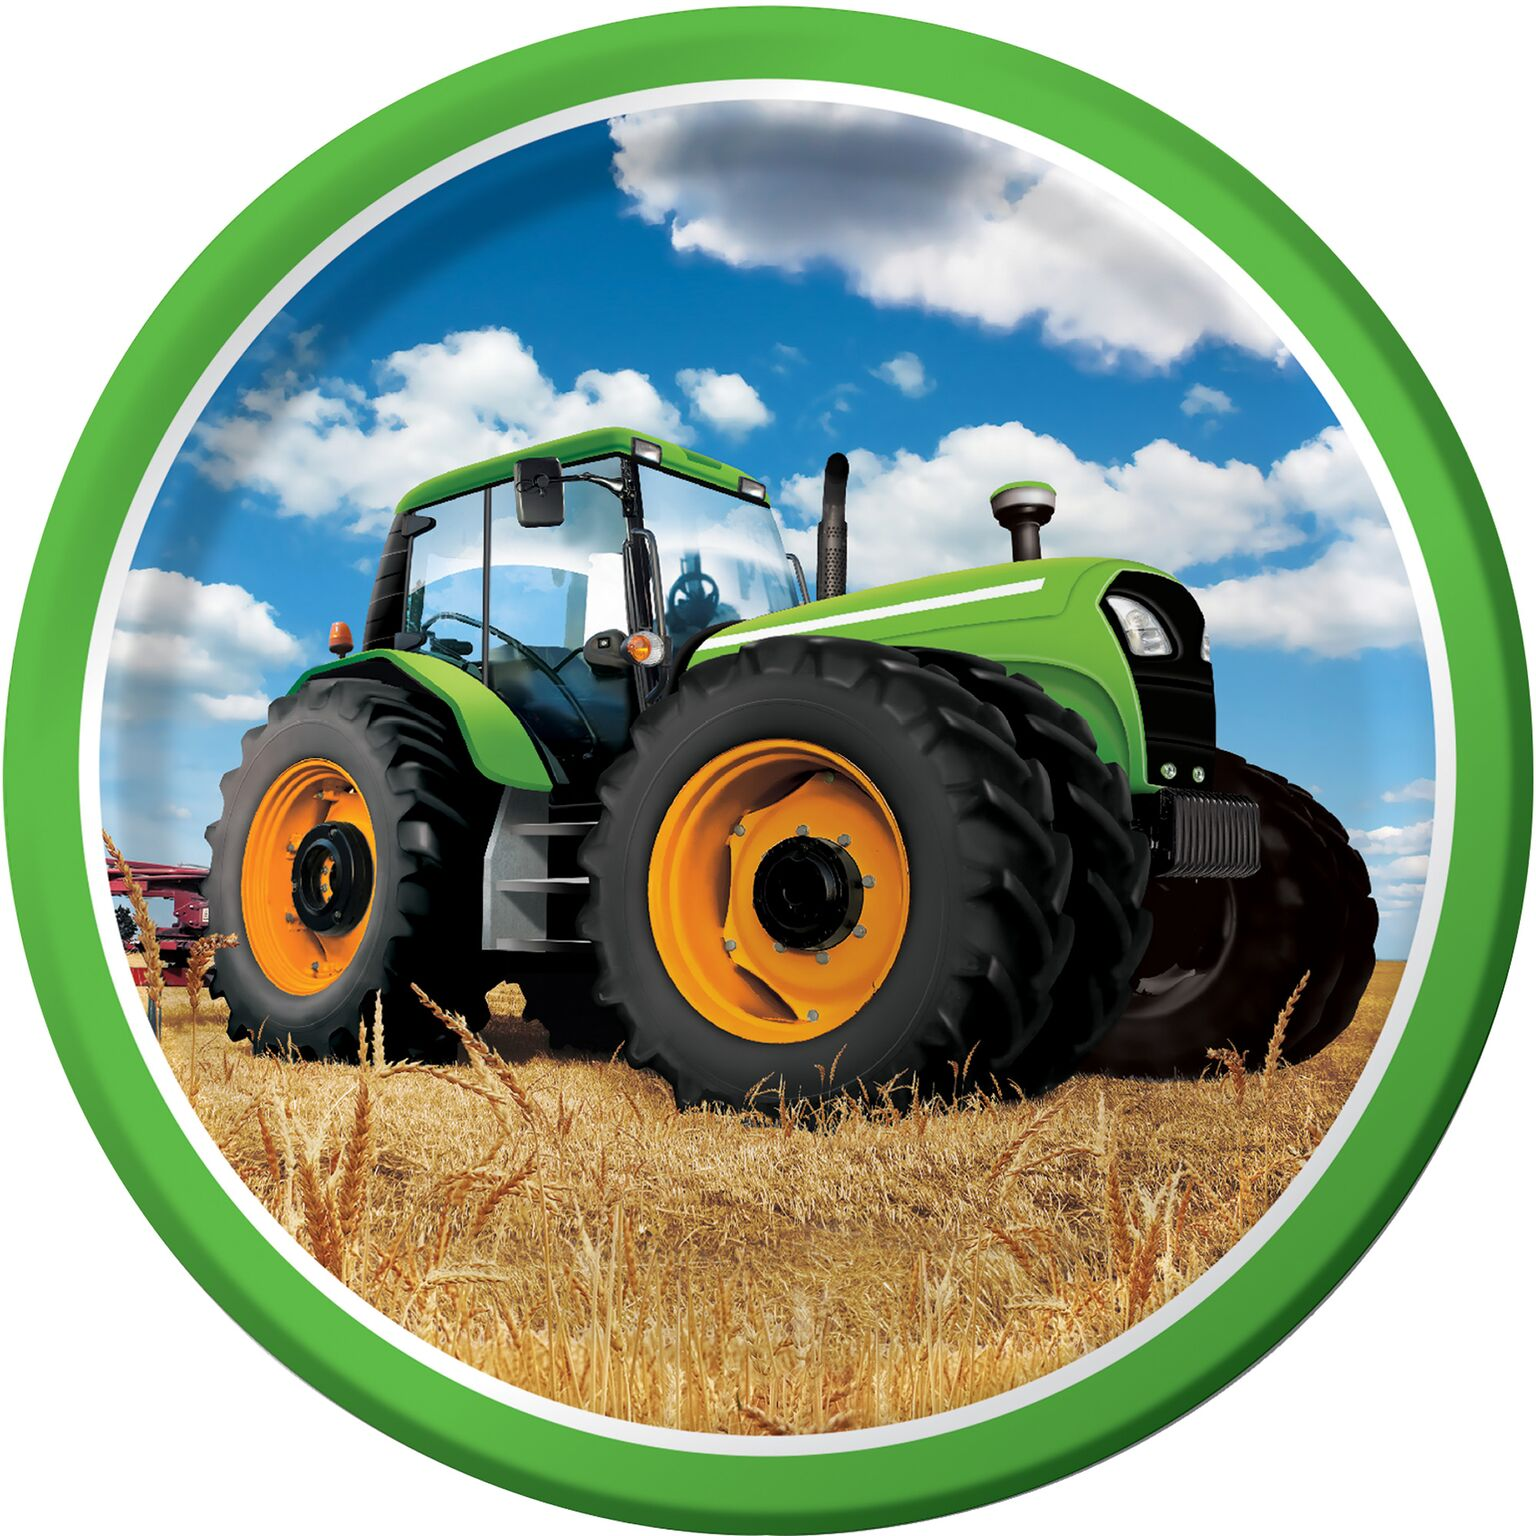 Teller-mit-grossem-Traktor-gruen